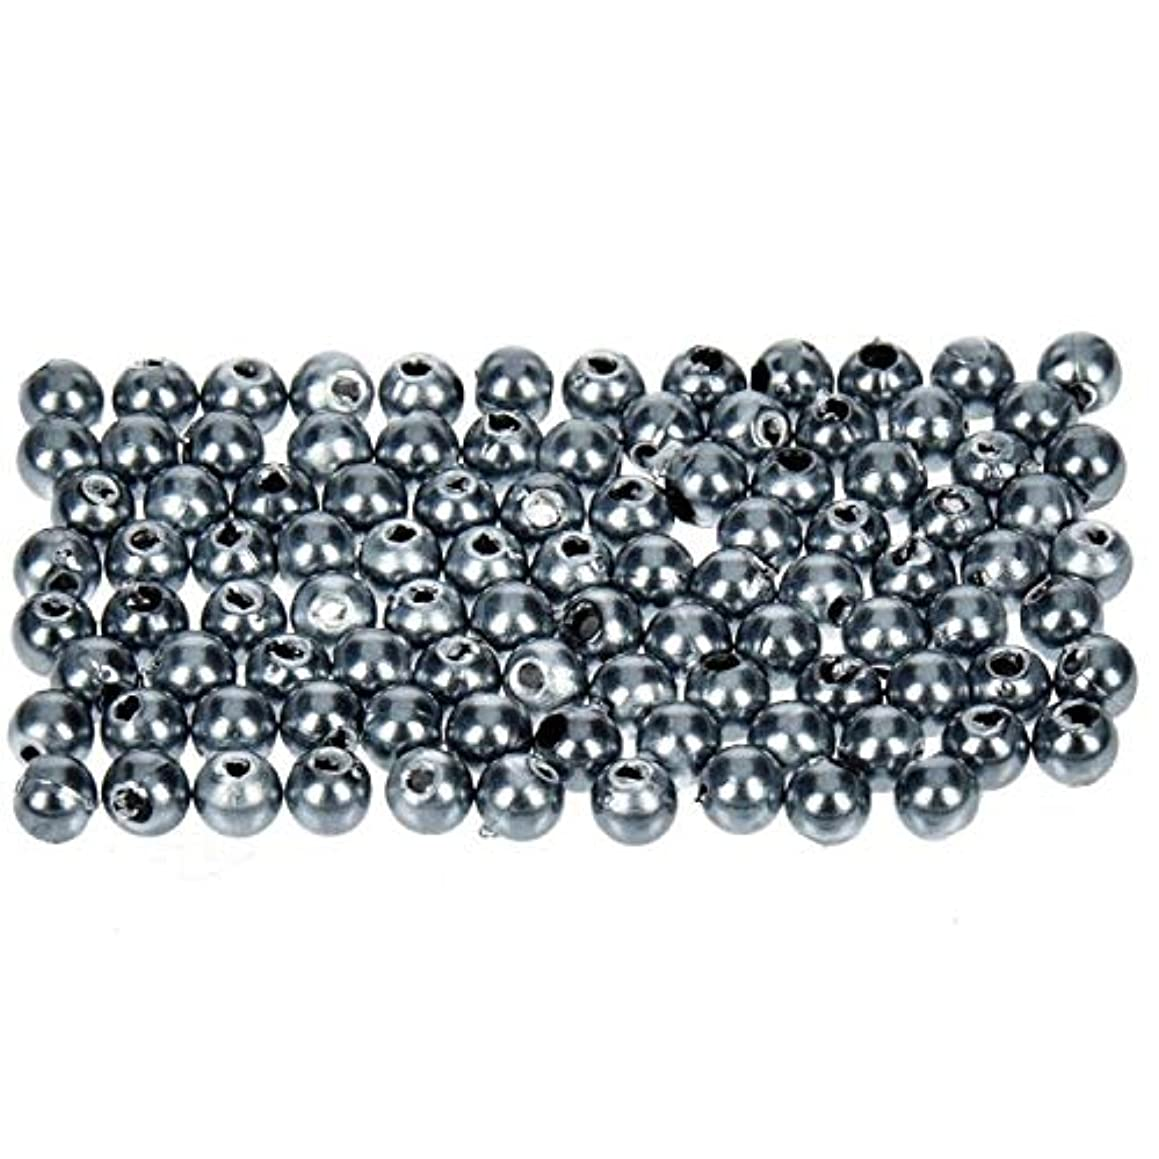 Efco Wax Beads, Plastic, Anthracite, 4 mm Diameter, 100-Piece